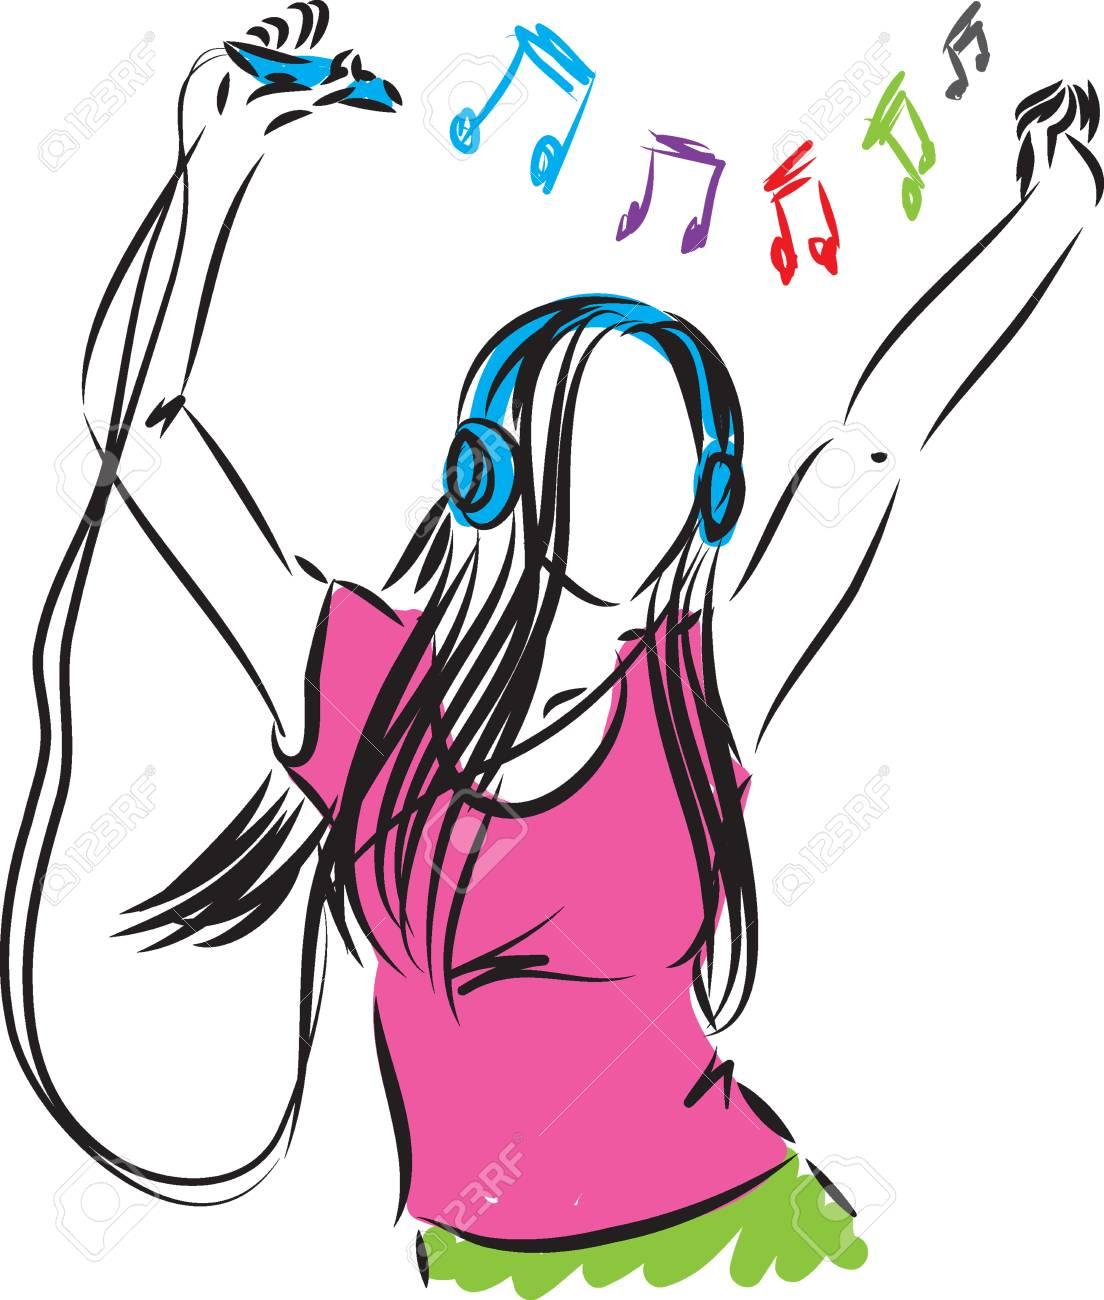 lady girl listening music illustration.